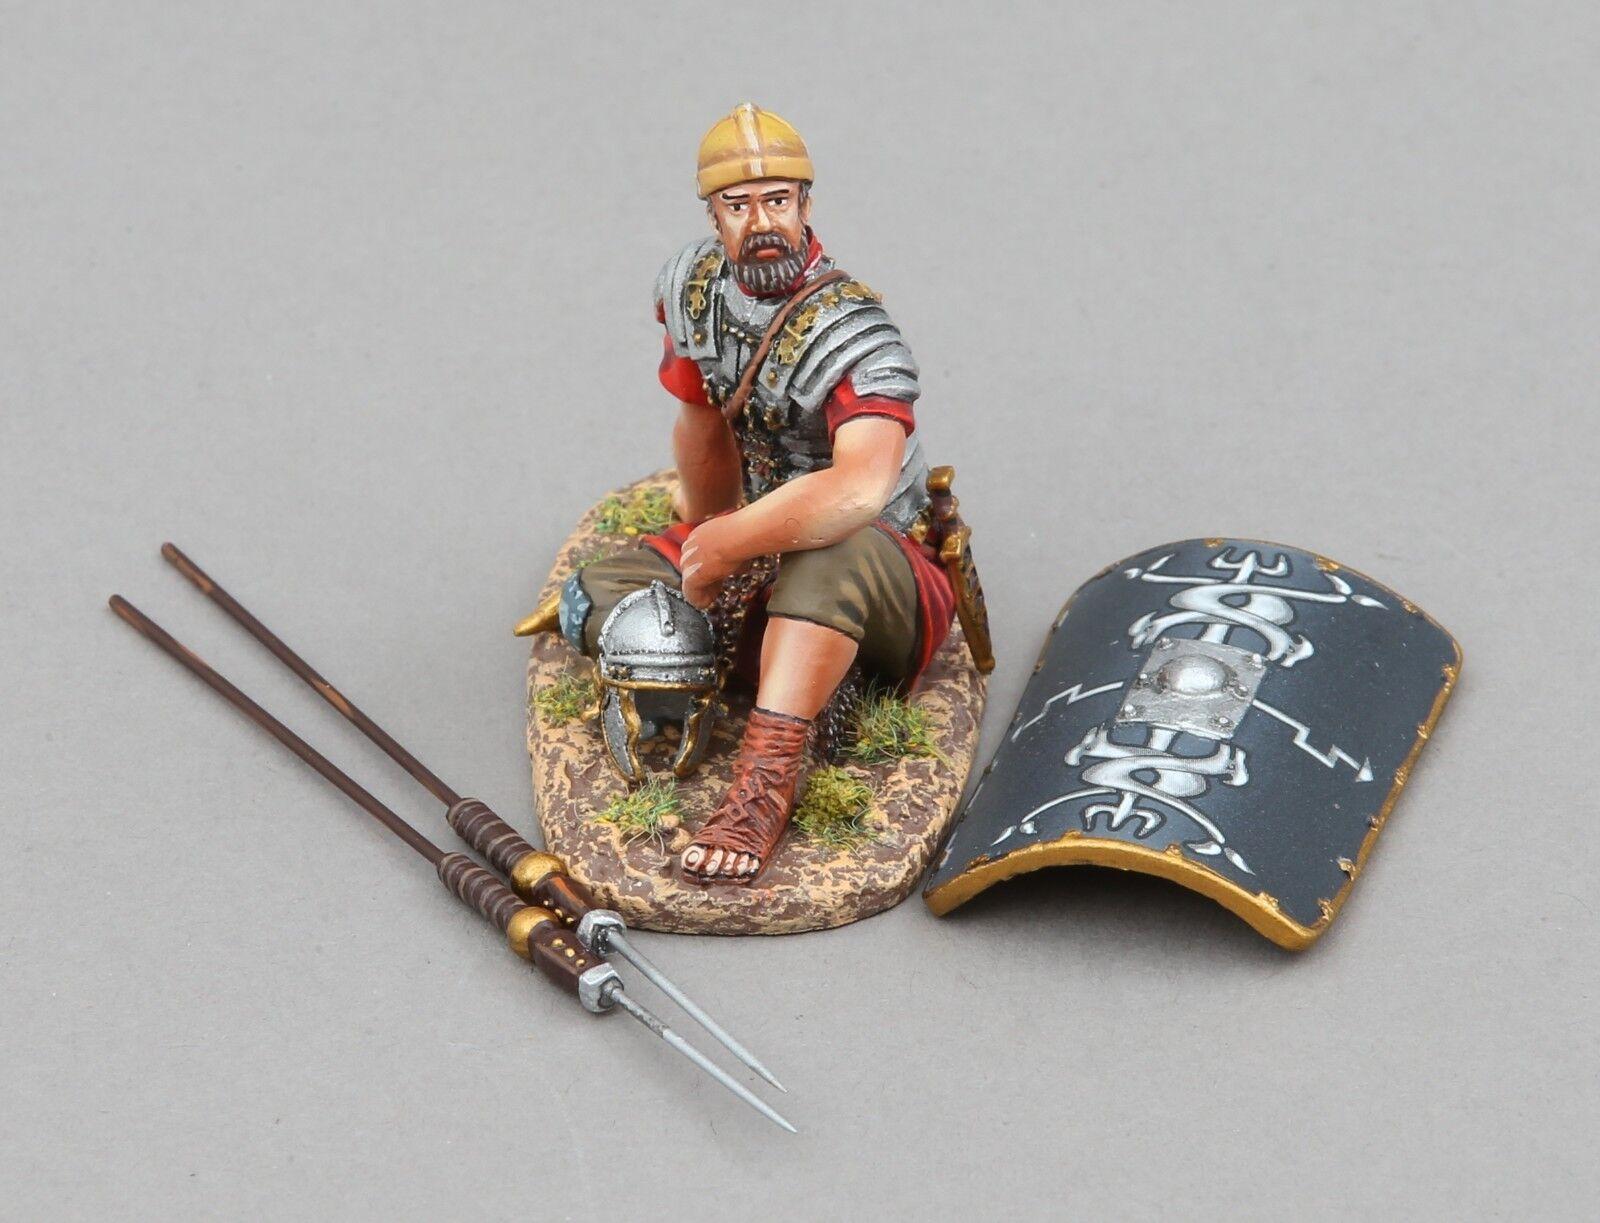 Thomas Gunn Roman Empire ROM096B 30th Legionär Ruhender Schwarz MIB